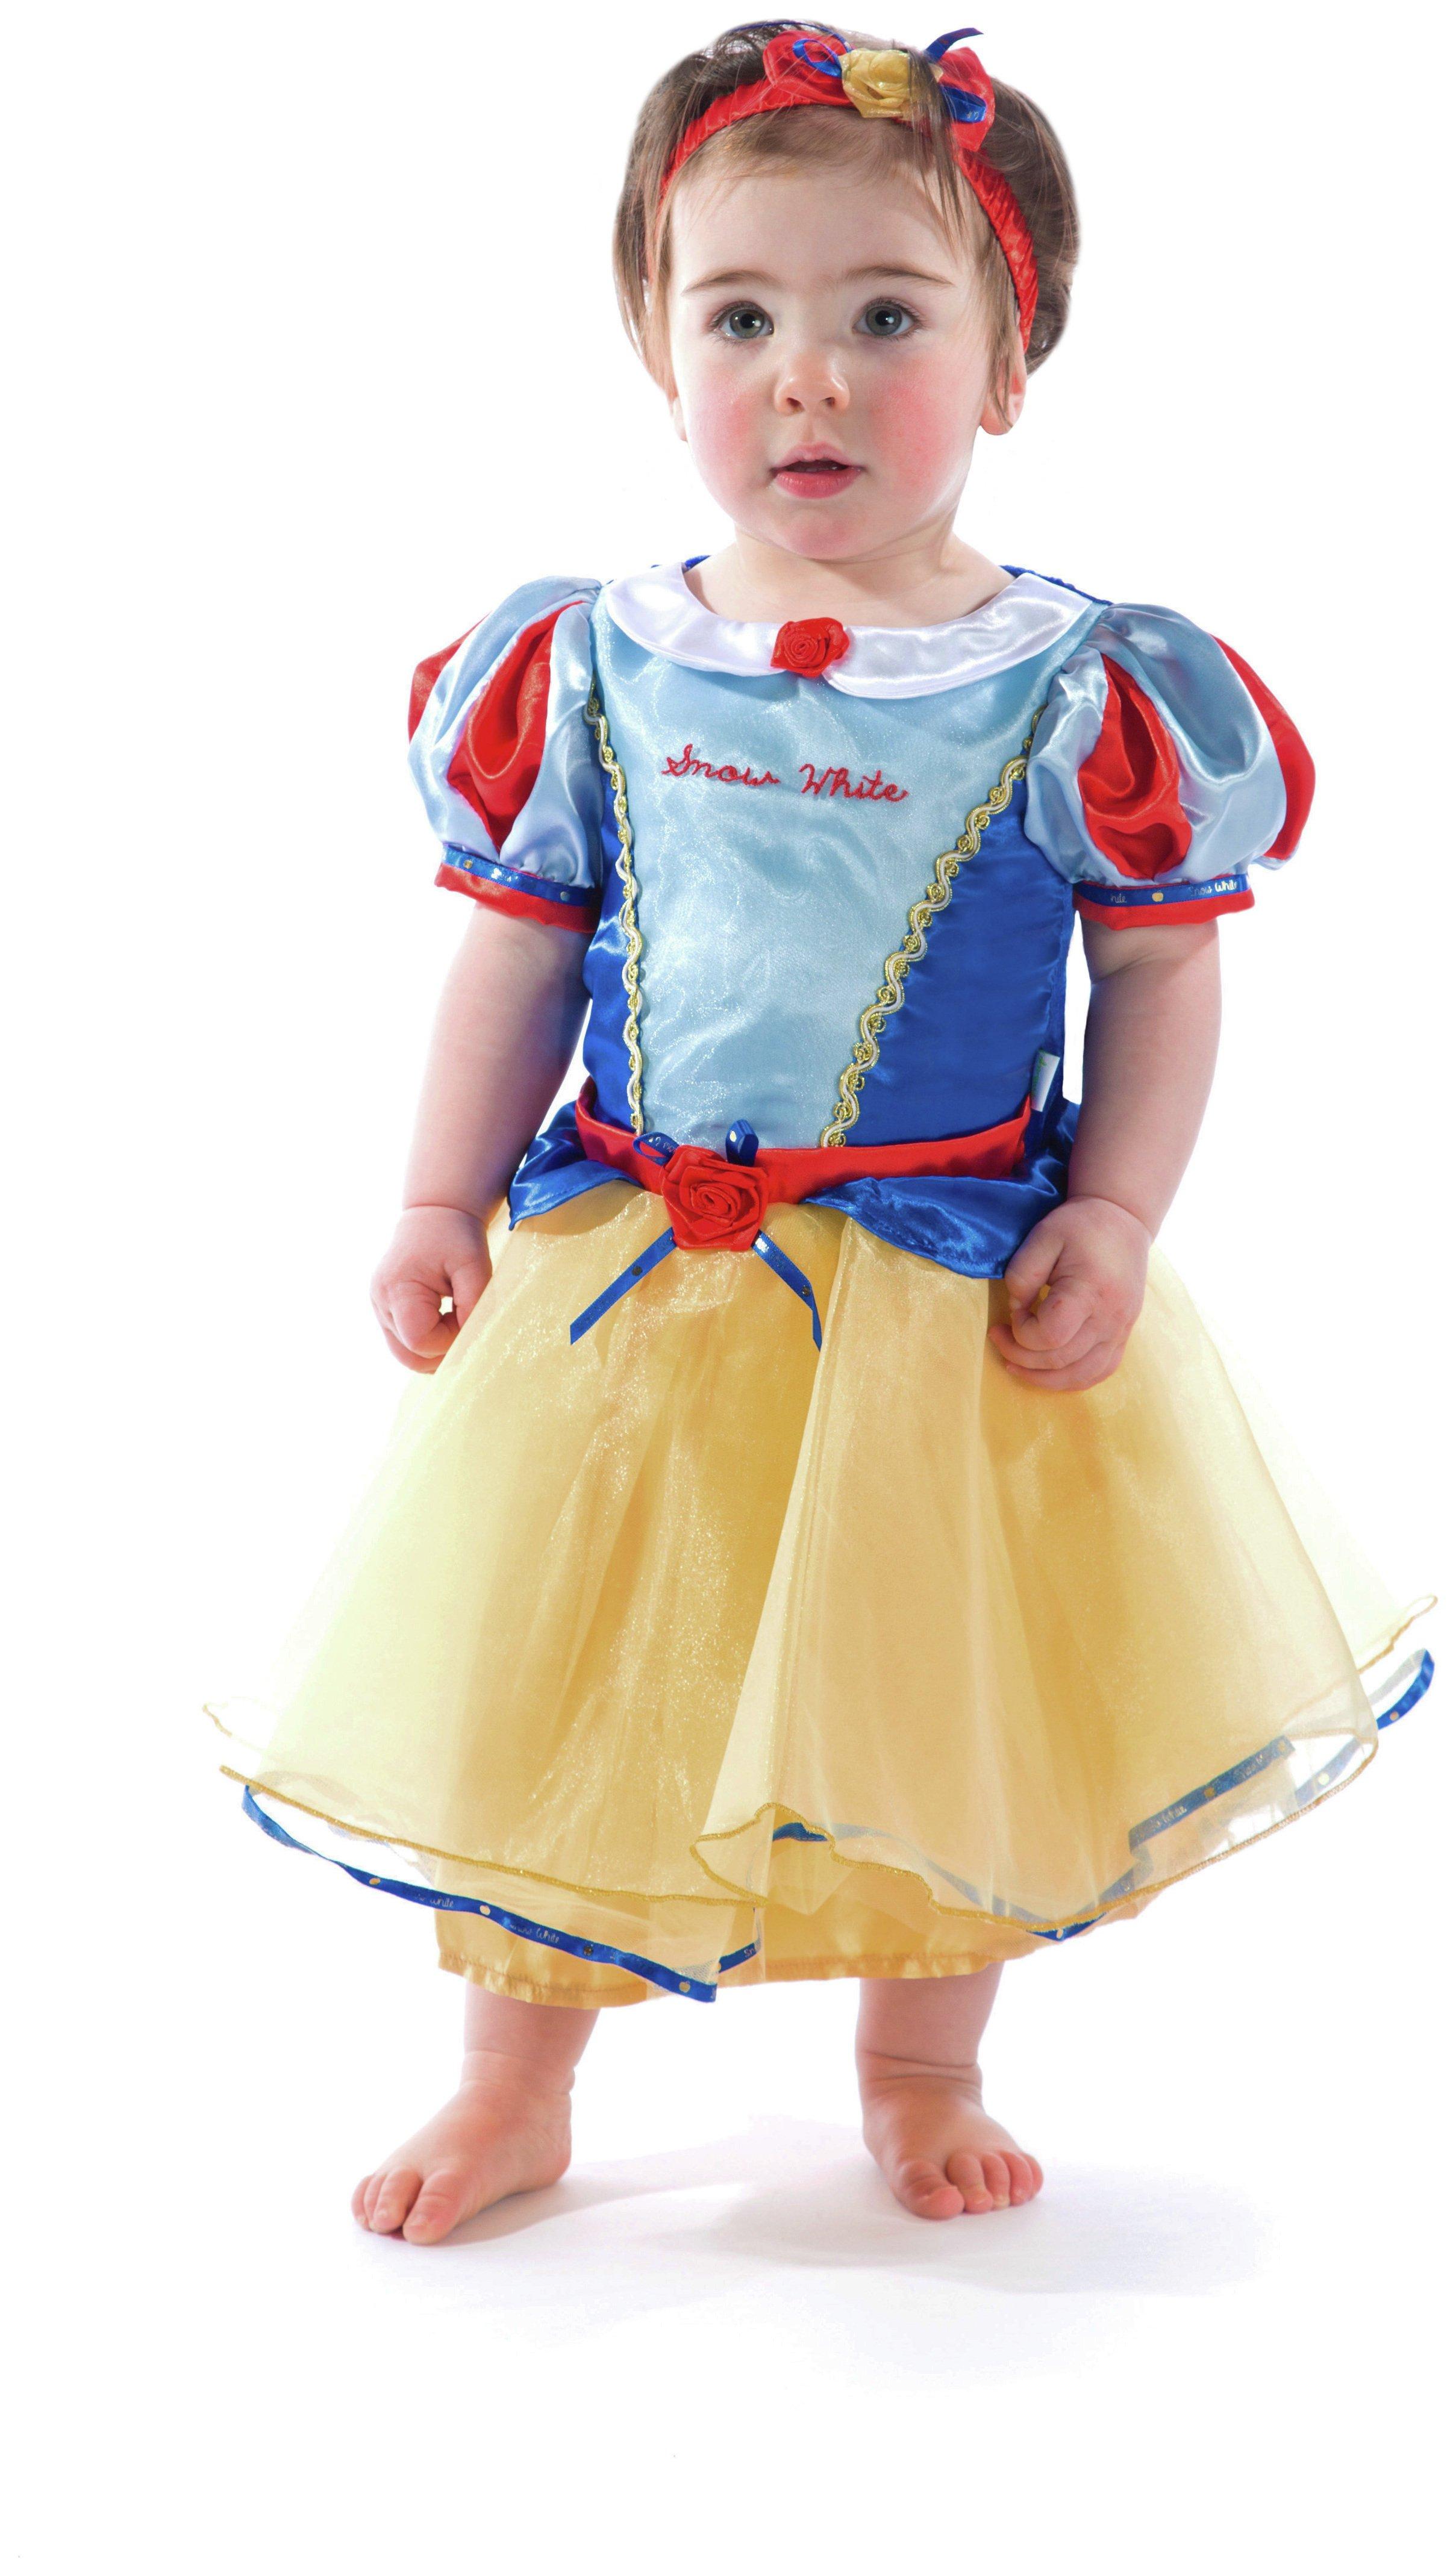 Image of Disney Princess Snow White - 3 to 6 months.